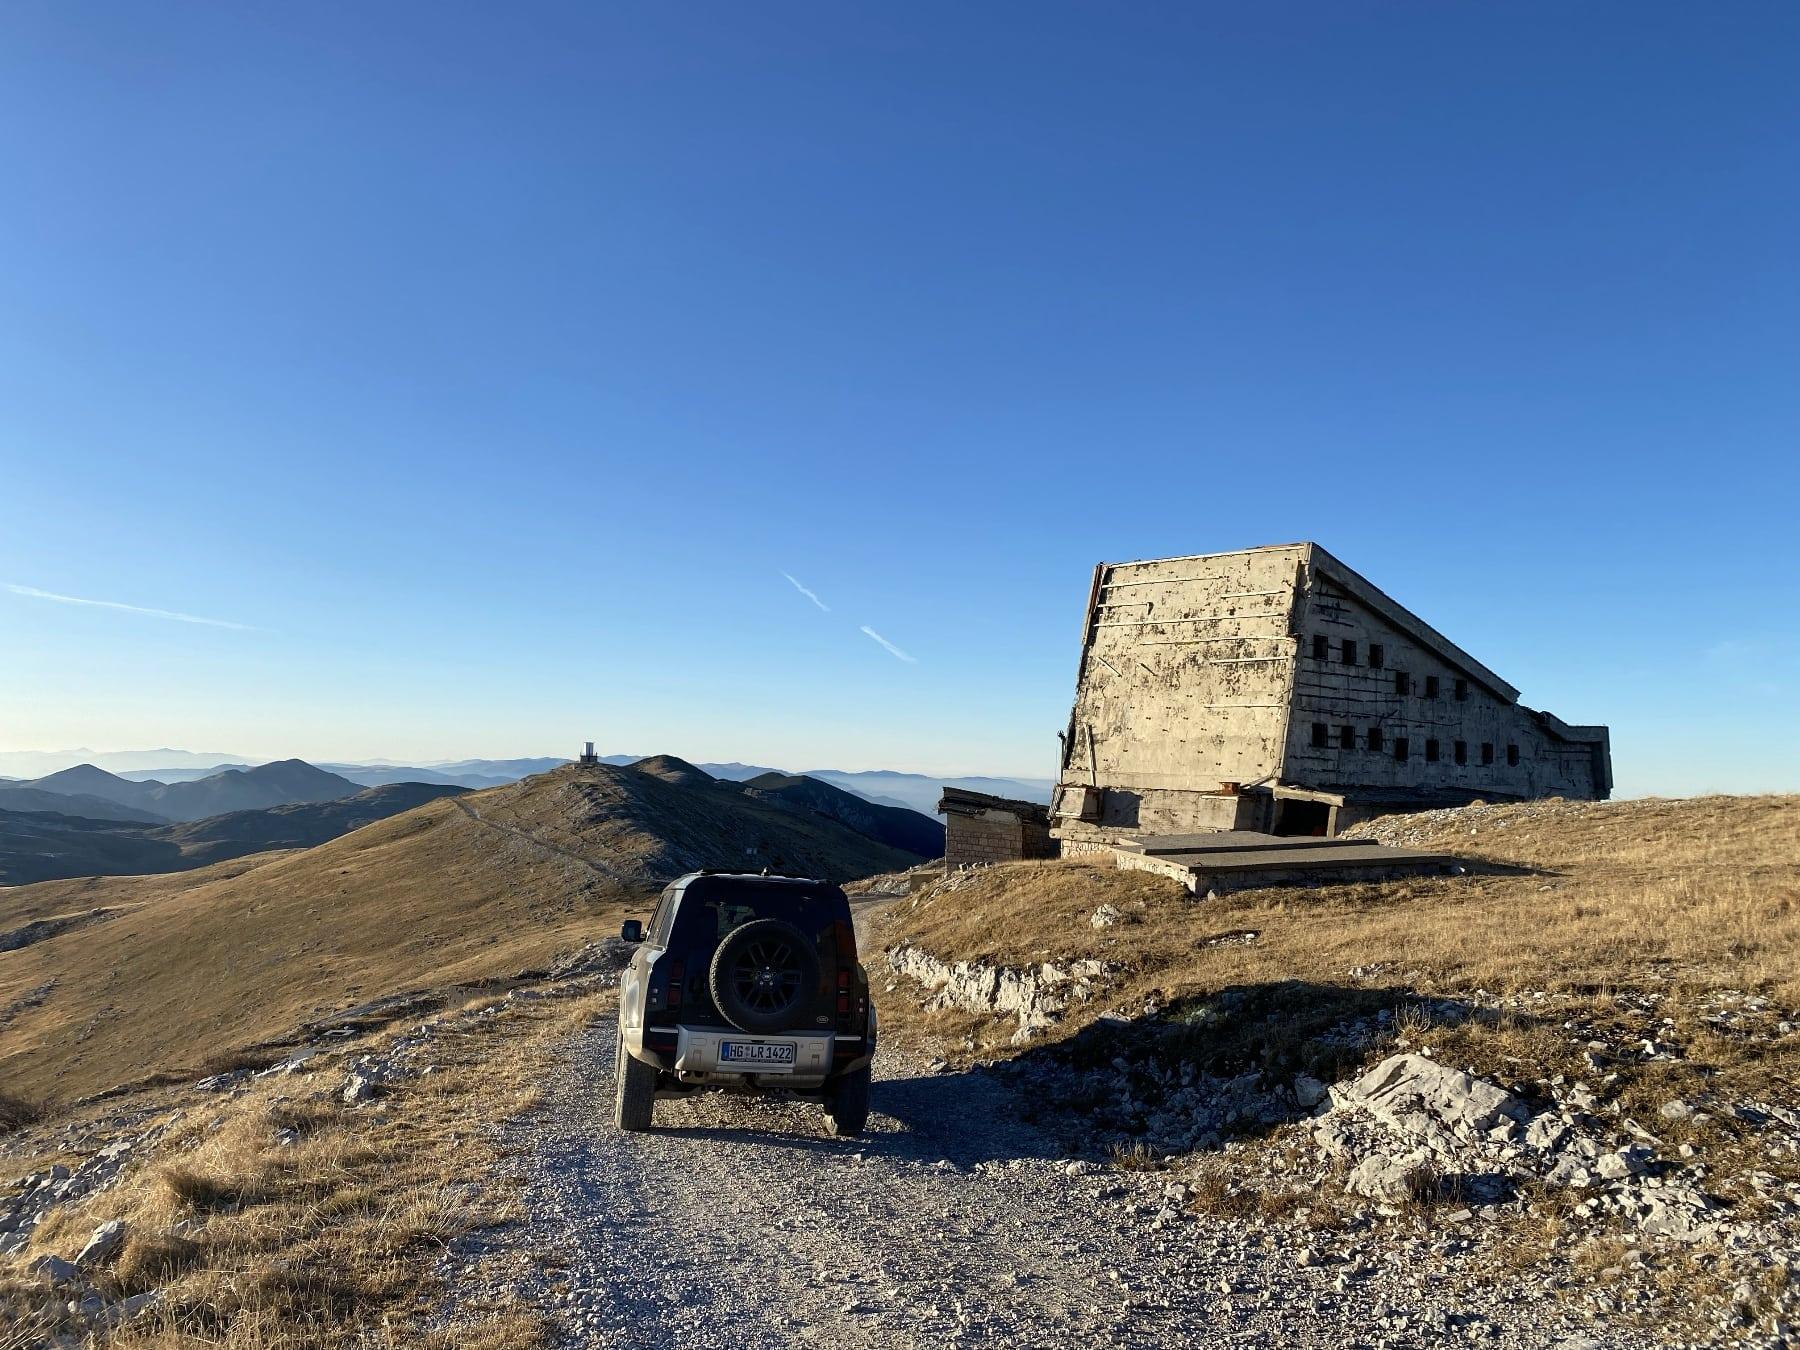 So close to heaven - In The Mountain Village Lukomir 5